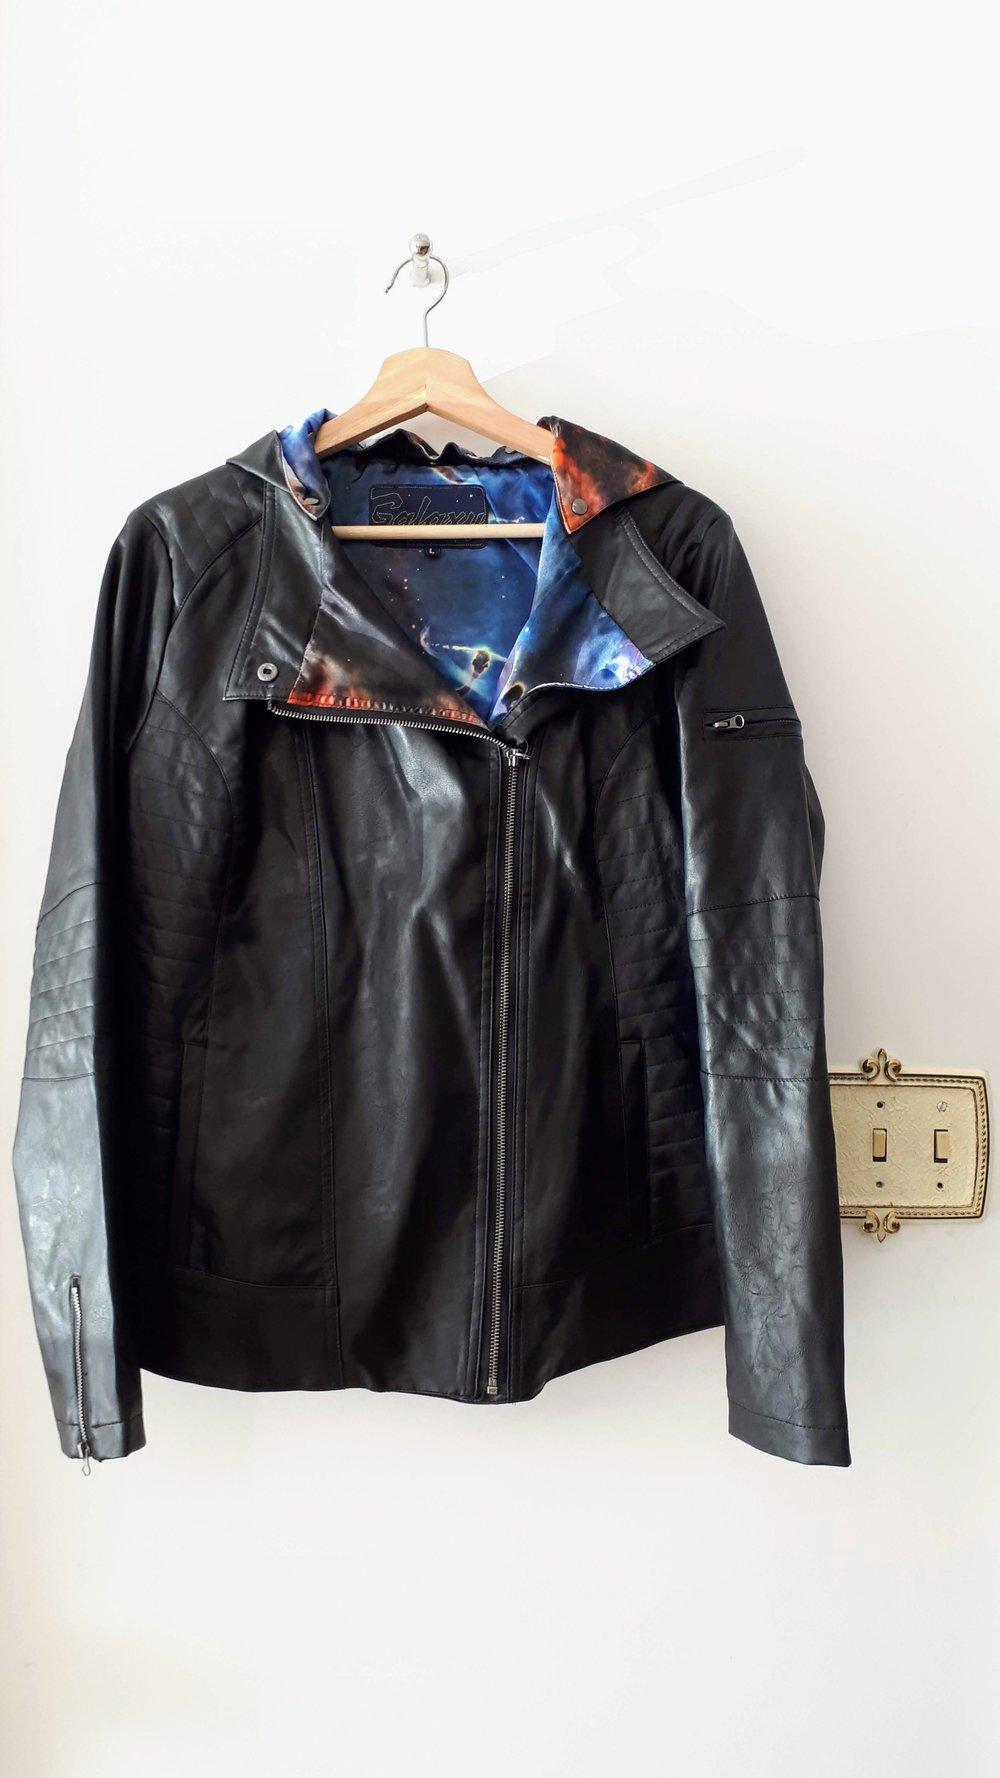 Thinkgeek jacket (NWT); Size L, $58